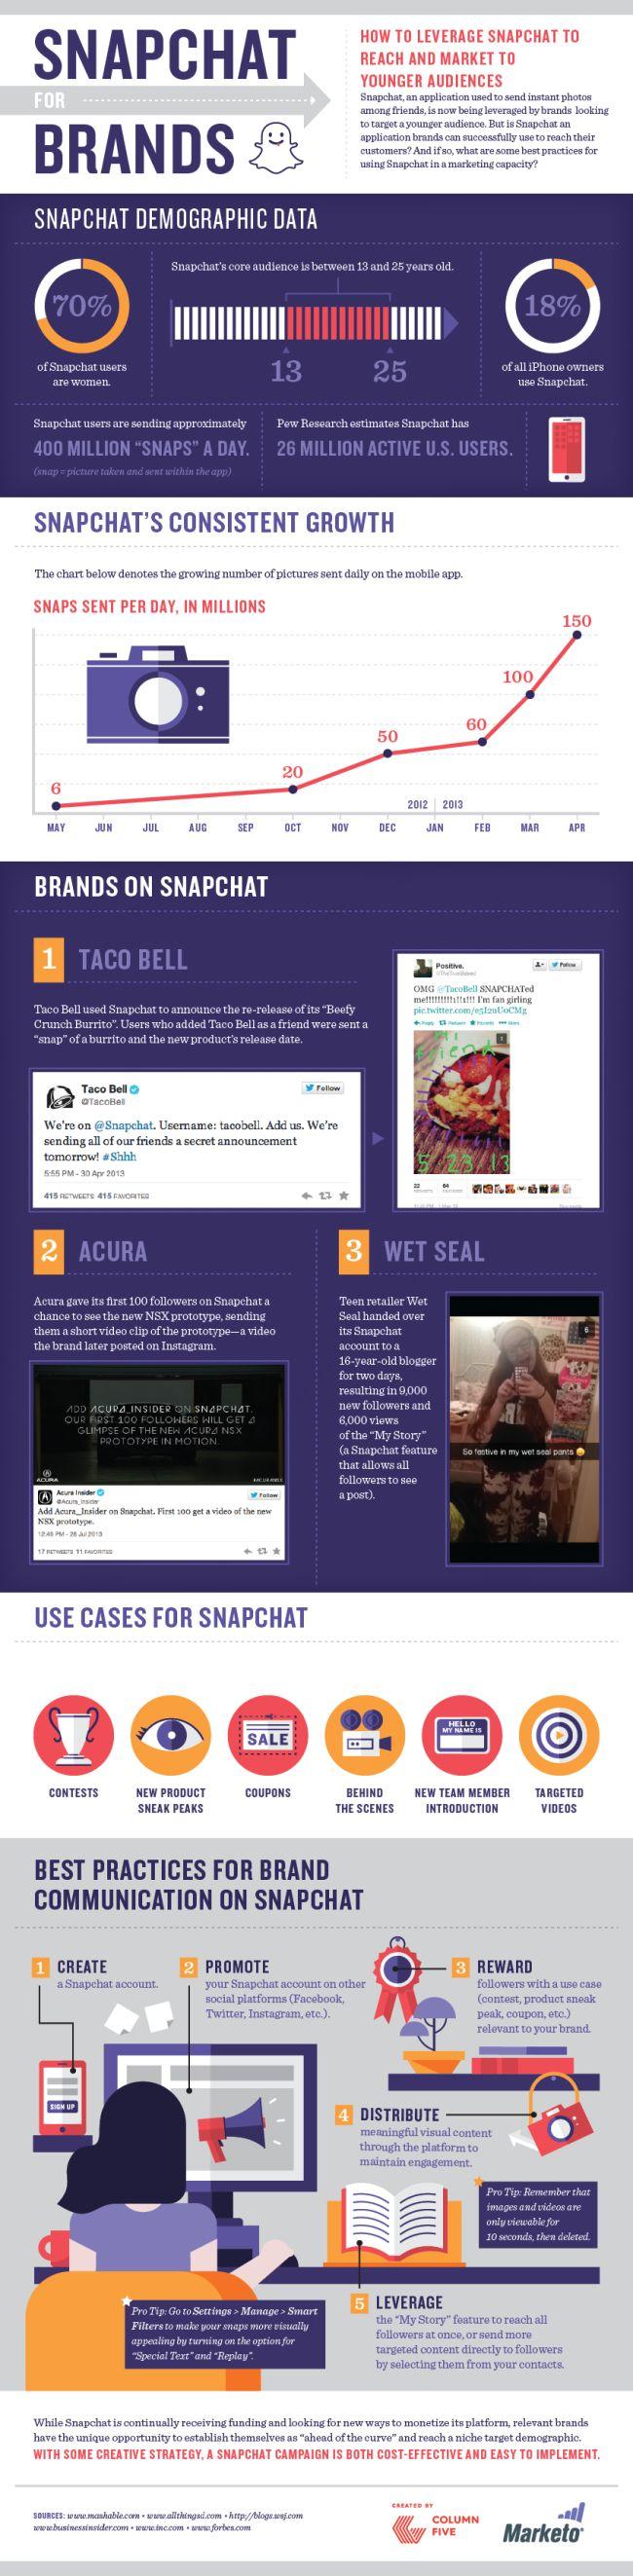 How Can Brands Use Snapchat? #Infographic #DigitalMarketing #SprintOn